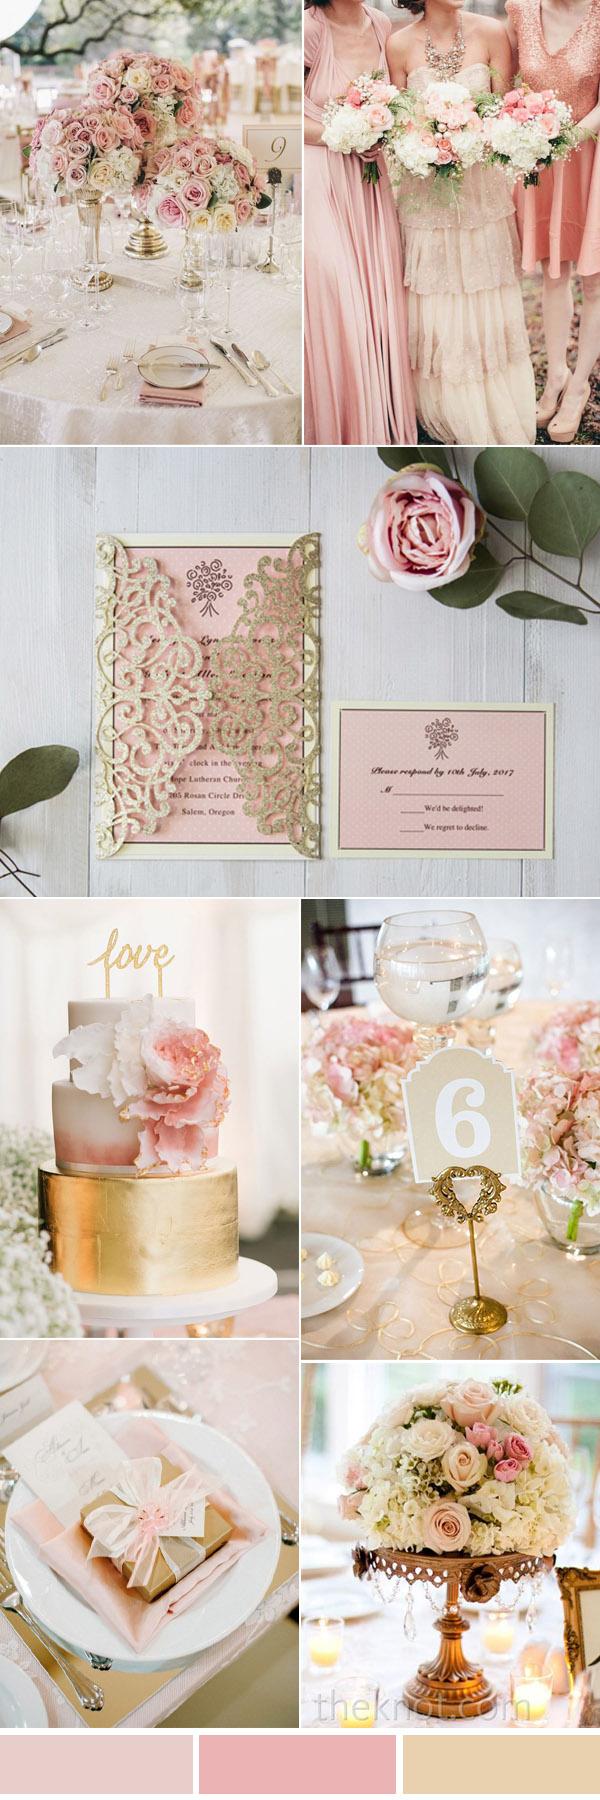 Inspiration I Do Pinterest Wedding Wedding And Quinceanera Ideas